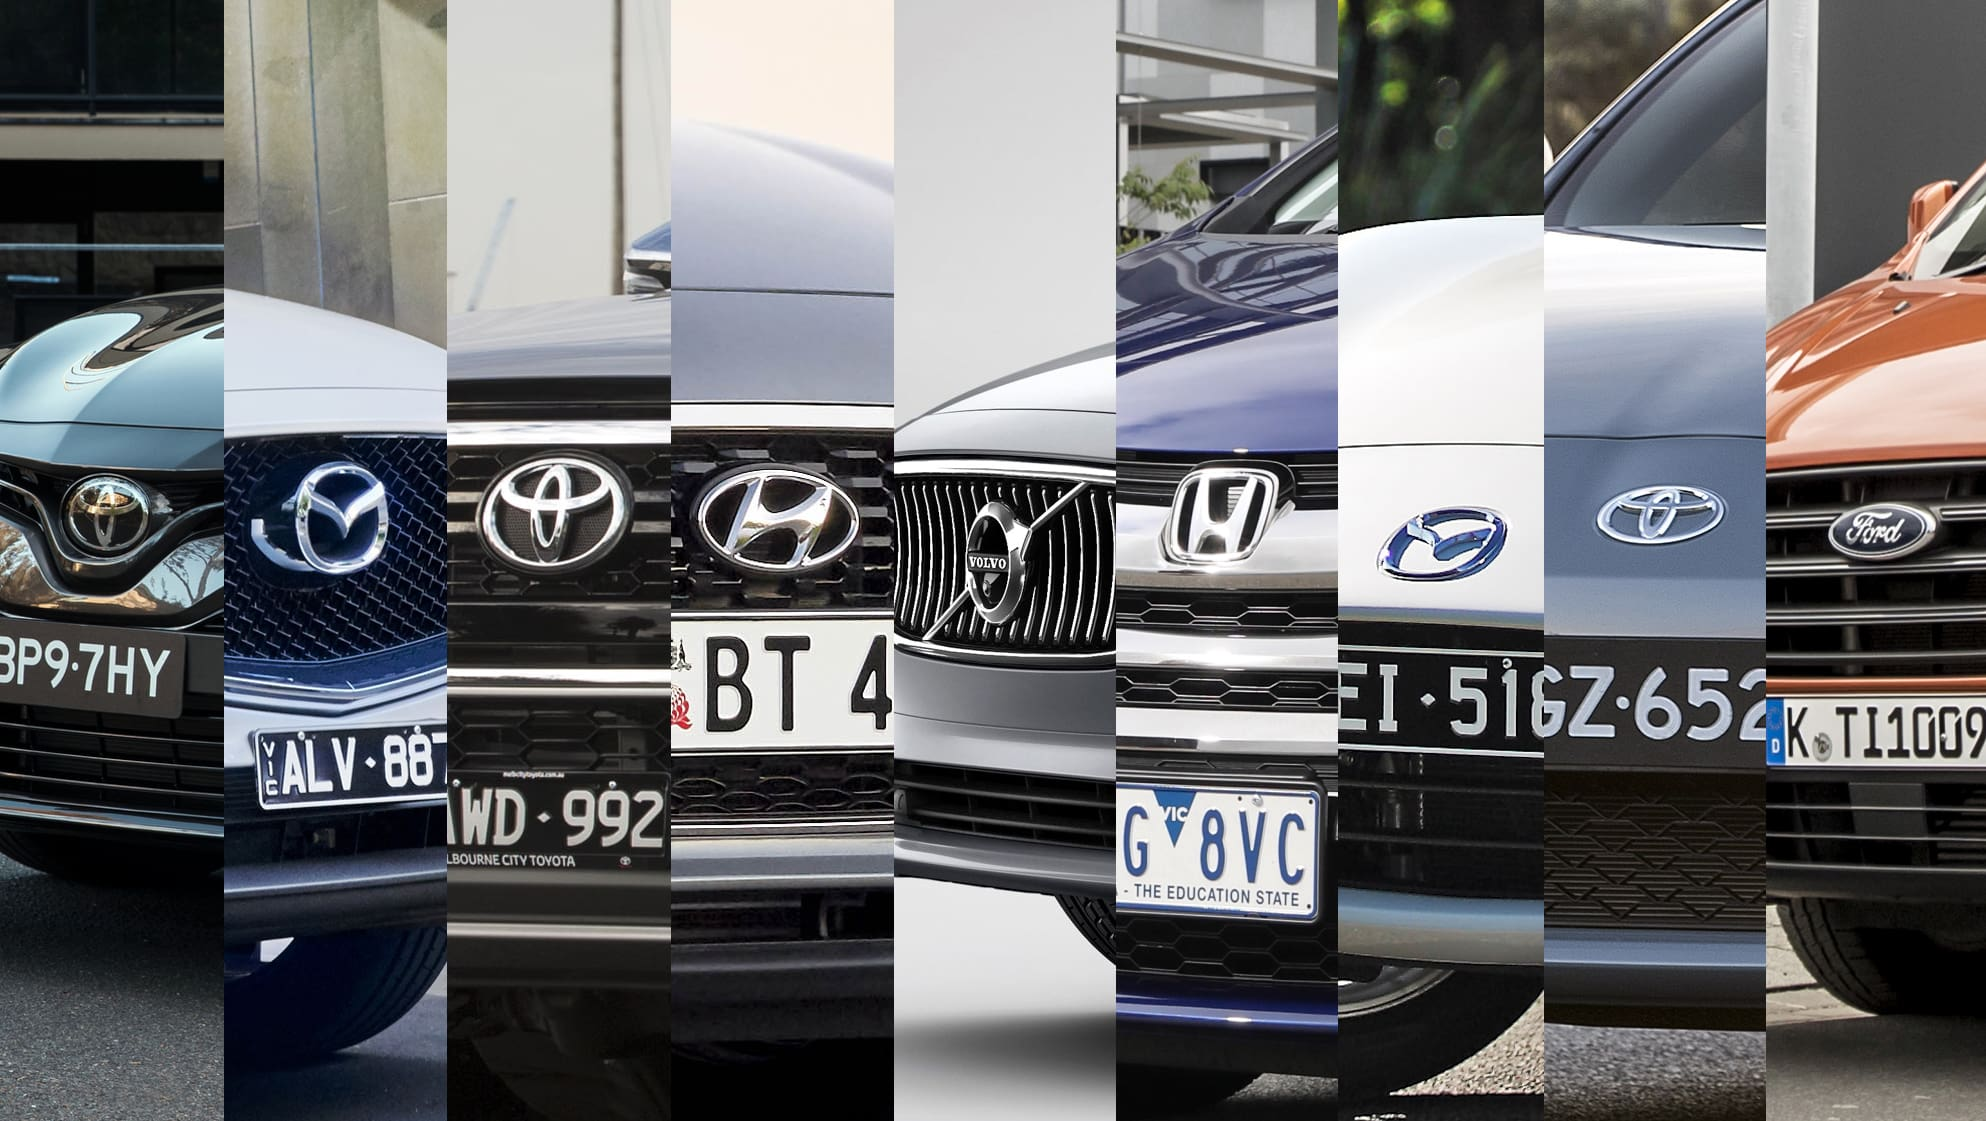 Wot Car: What Car Should I Buy?